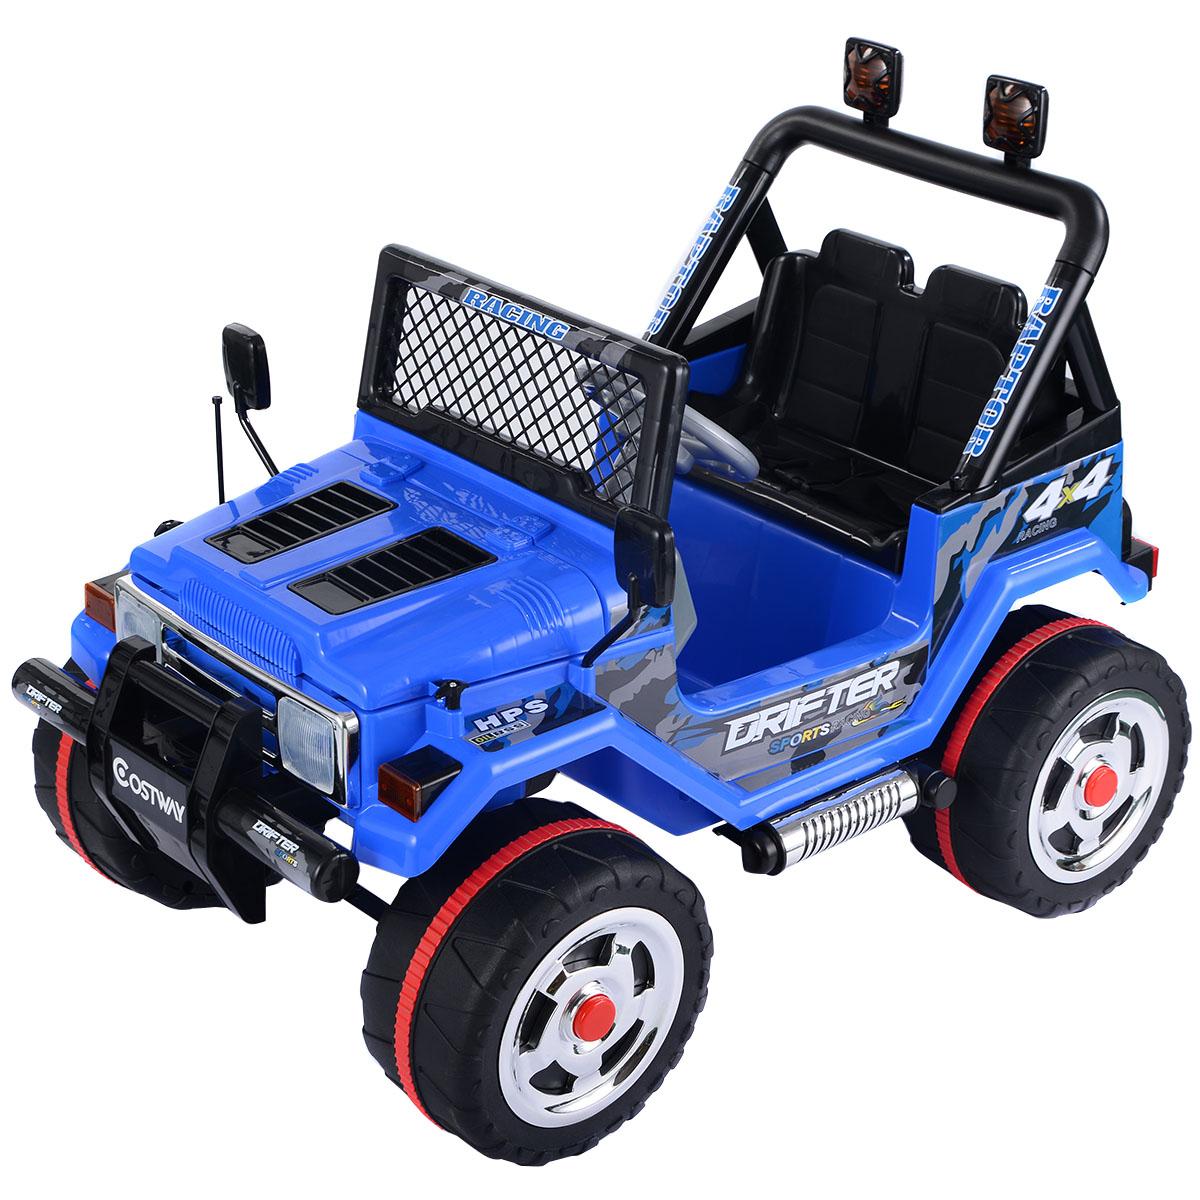 Costway 12V MP3 Kids Raptor Jeep Truck RC Ride On Car w  Double Motors & Batteries Blue by Costway